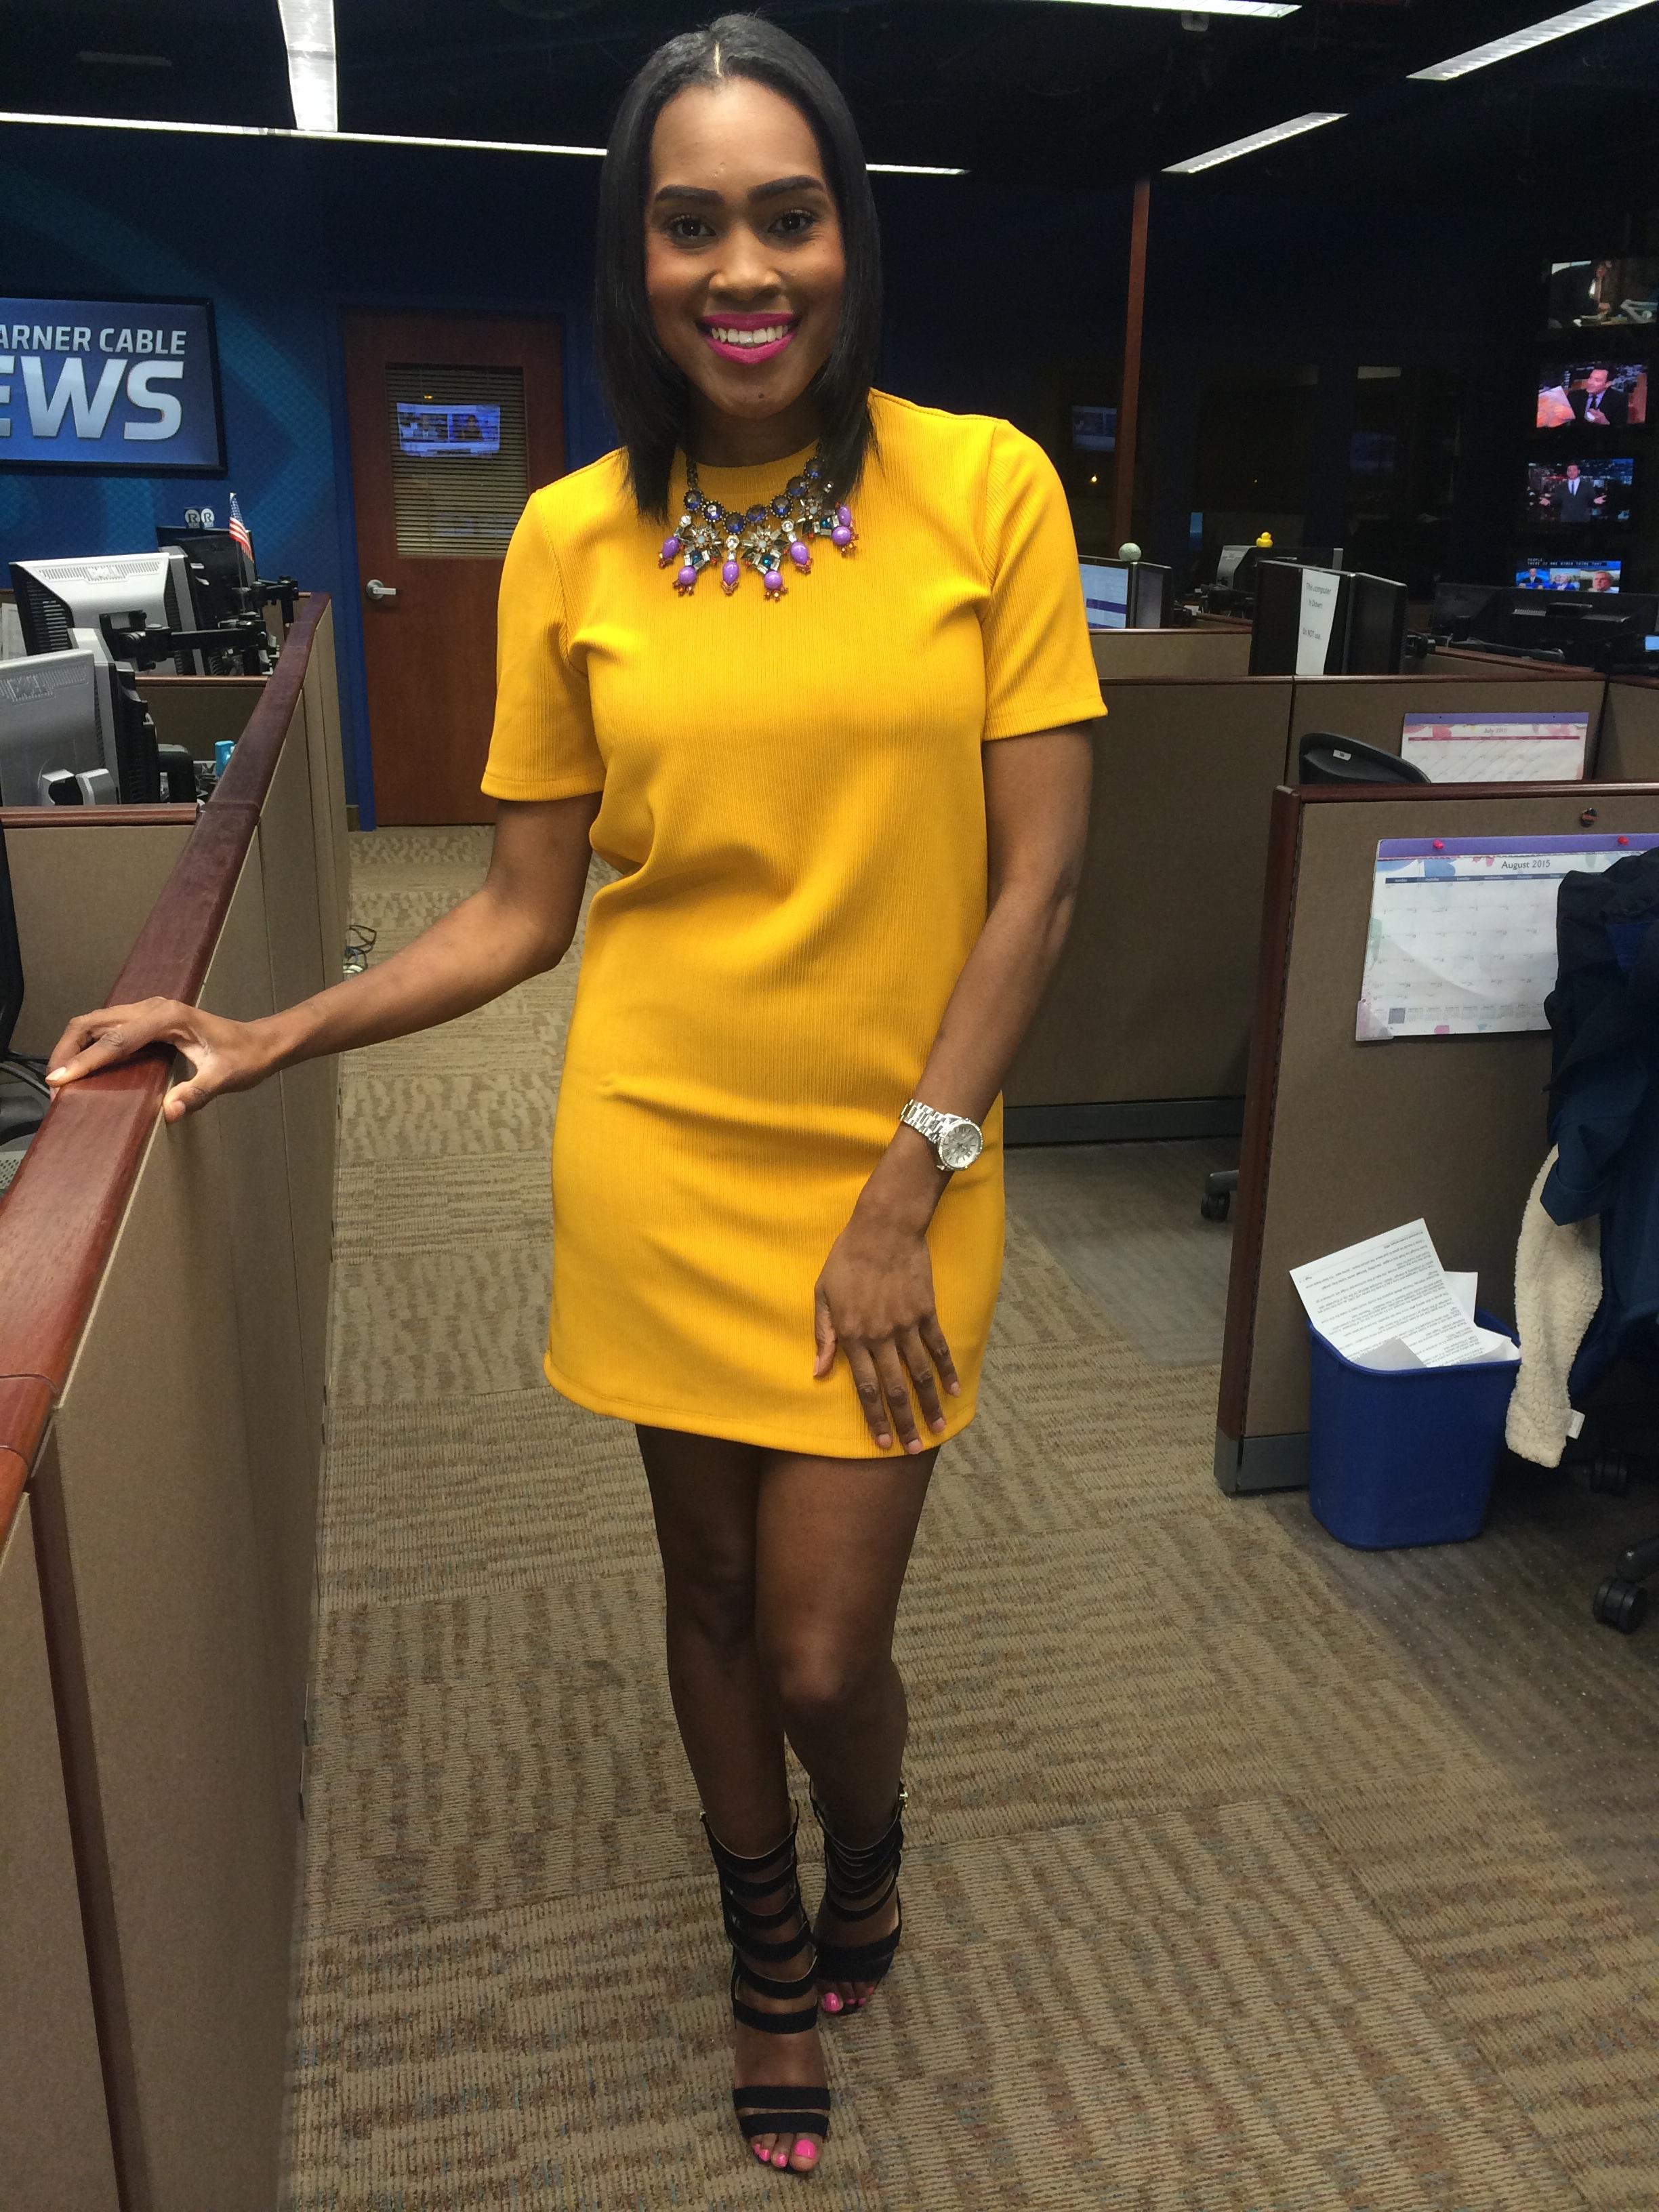 Style-files-forever-21-mustard-textured-stripe-shift-dress-justfab-florernce-heels-oohlalablog-workwear-3